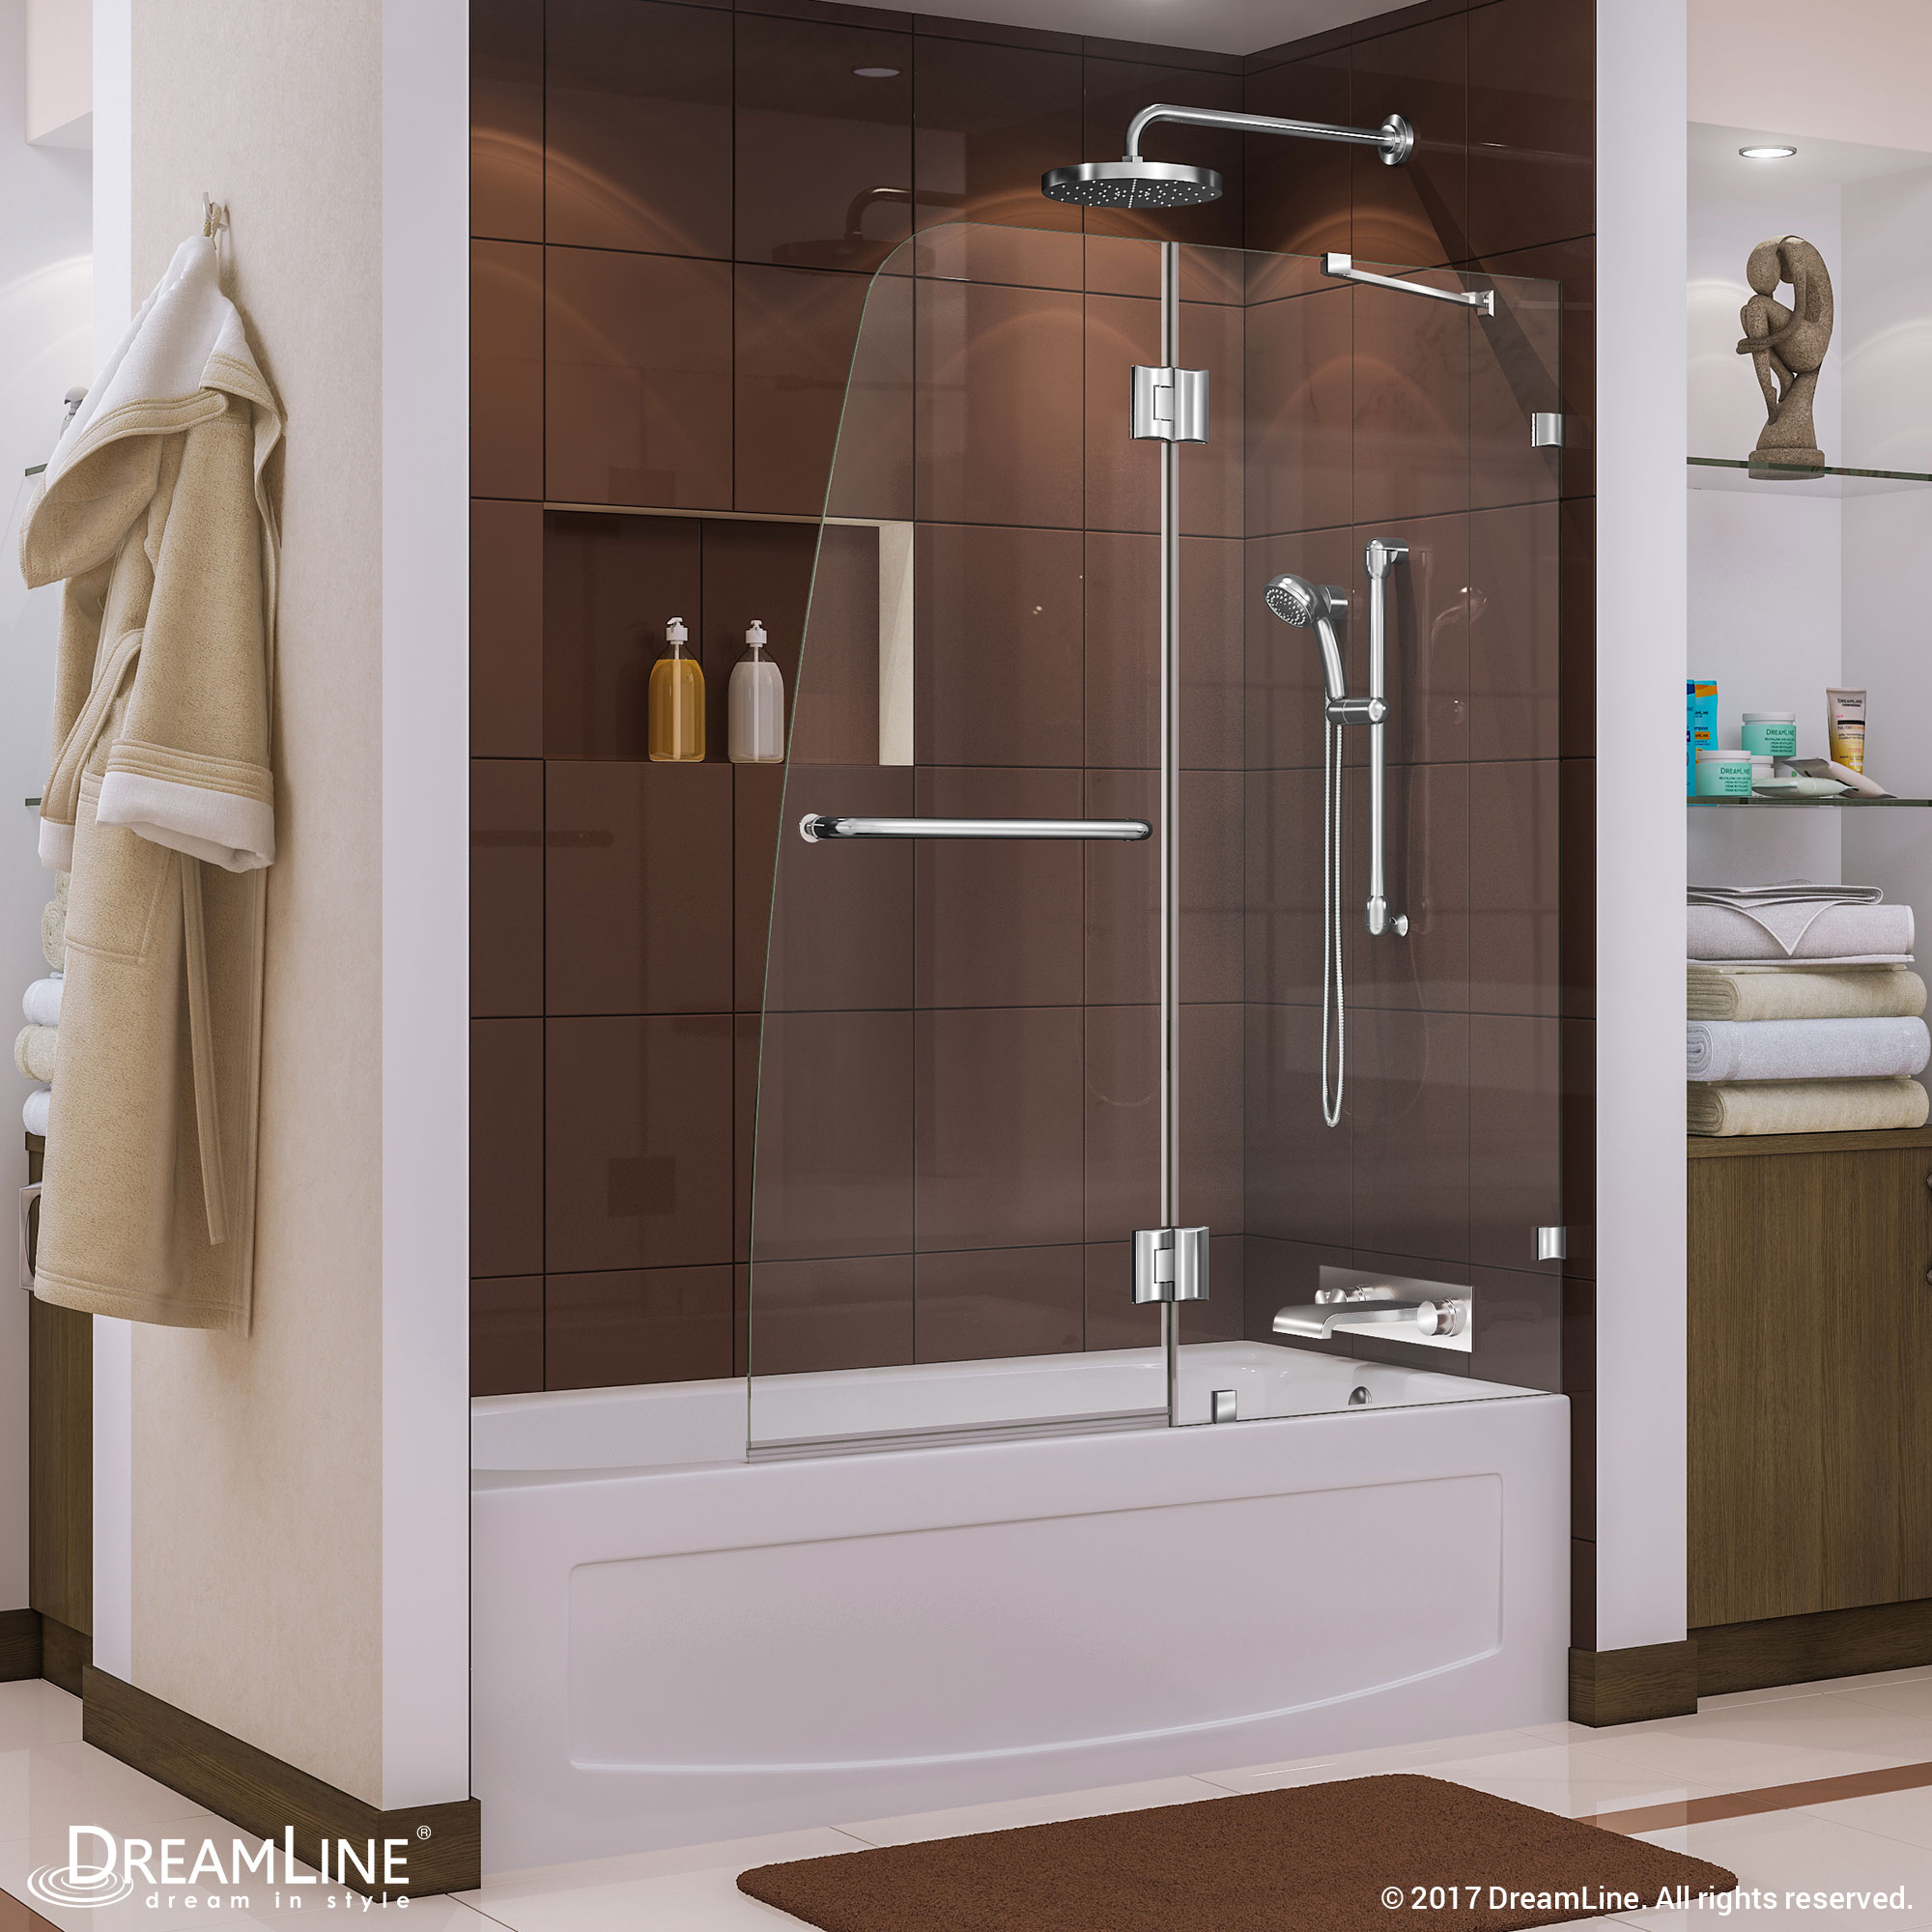 AquaFold 56 to 60 in. W x 30 in. D x 58 in. H Hinged Tub Door, Chrome